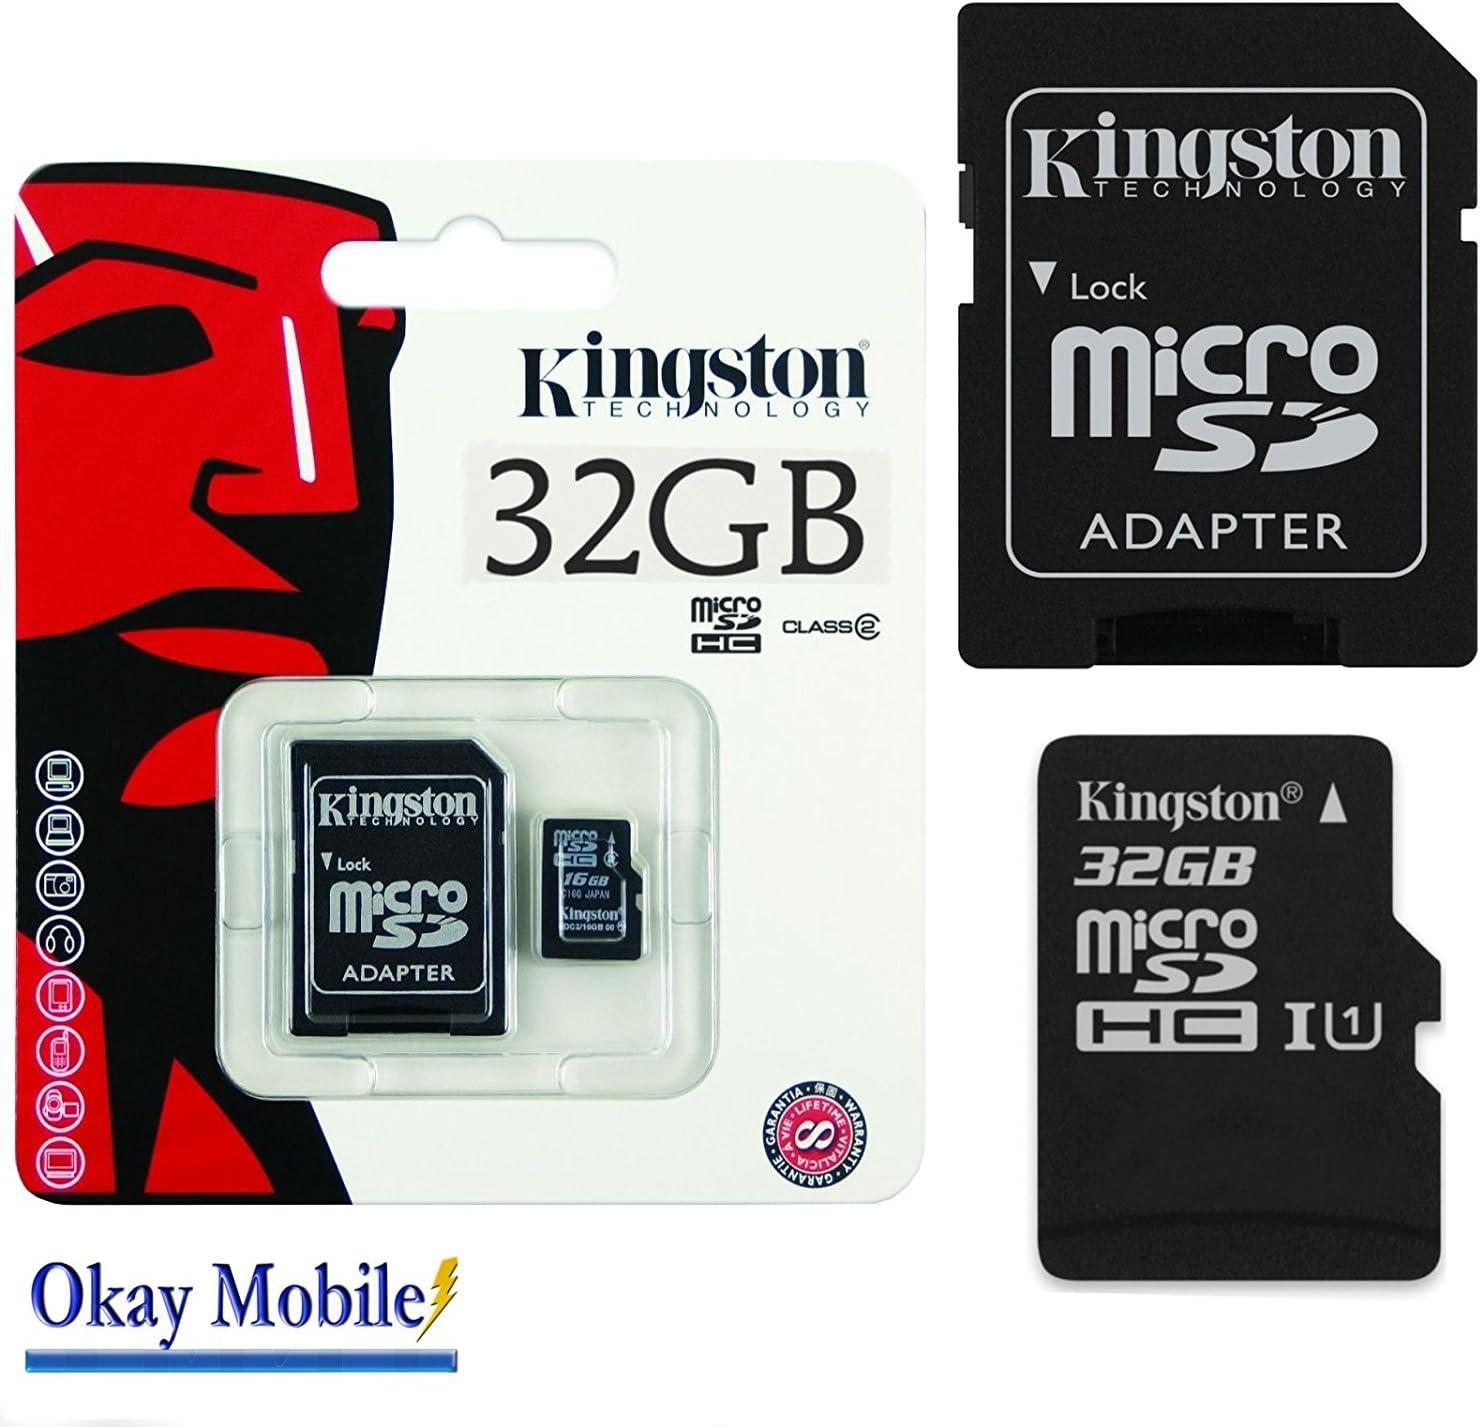 Okay Mobile Original Kingston MicroSD Tarjeta De Memoria SDHC 32GB para Samsung Galaxy A3(7) (2017) 32GB